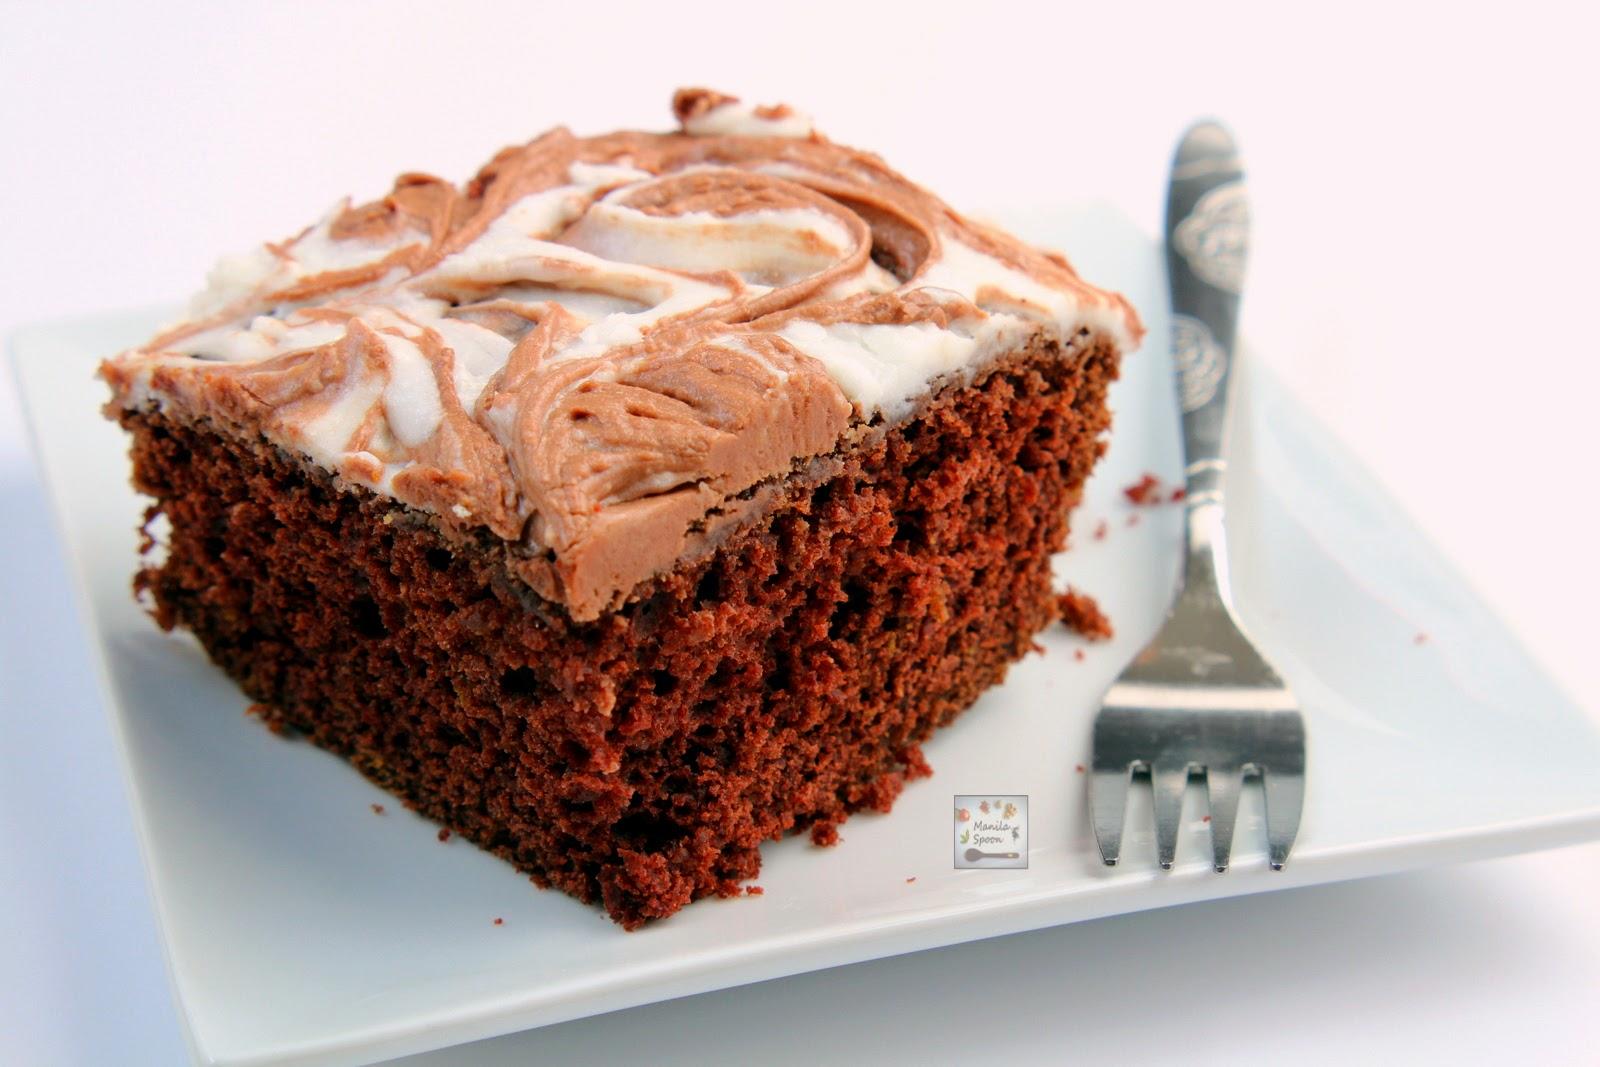 flavored chocolate cake recipe dishmaps orange flavored chocolate cake ...